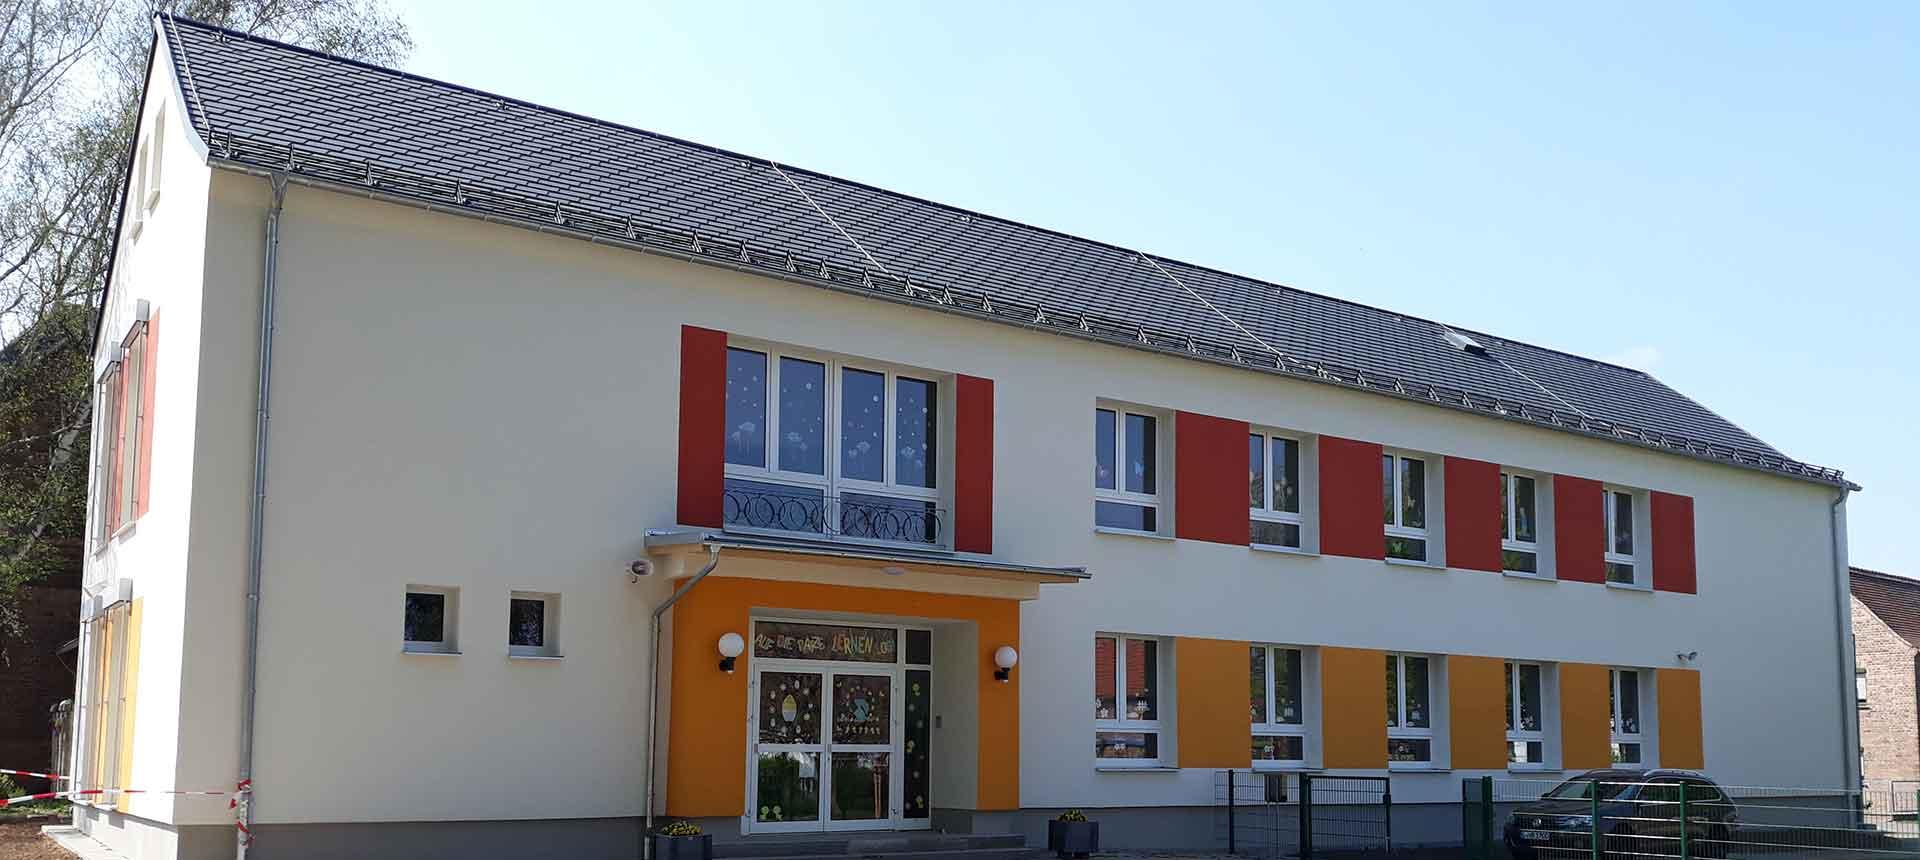 Luetzen-Grundschule-01